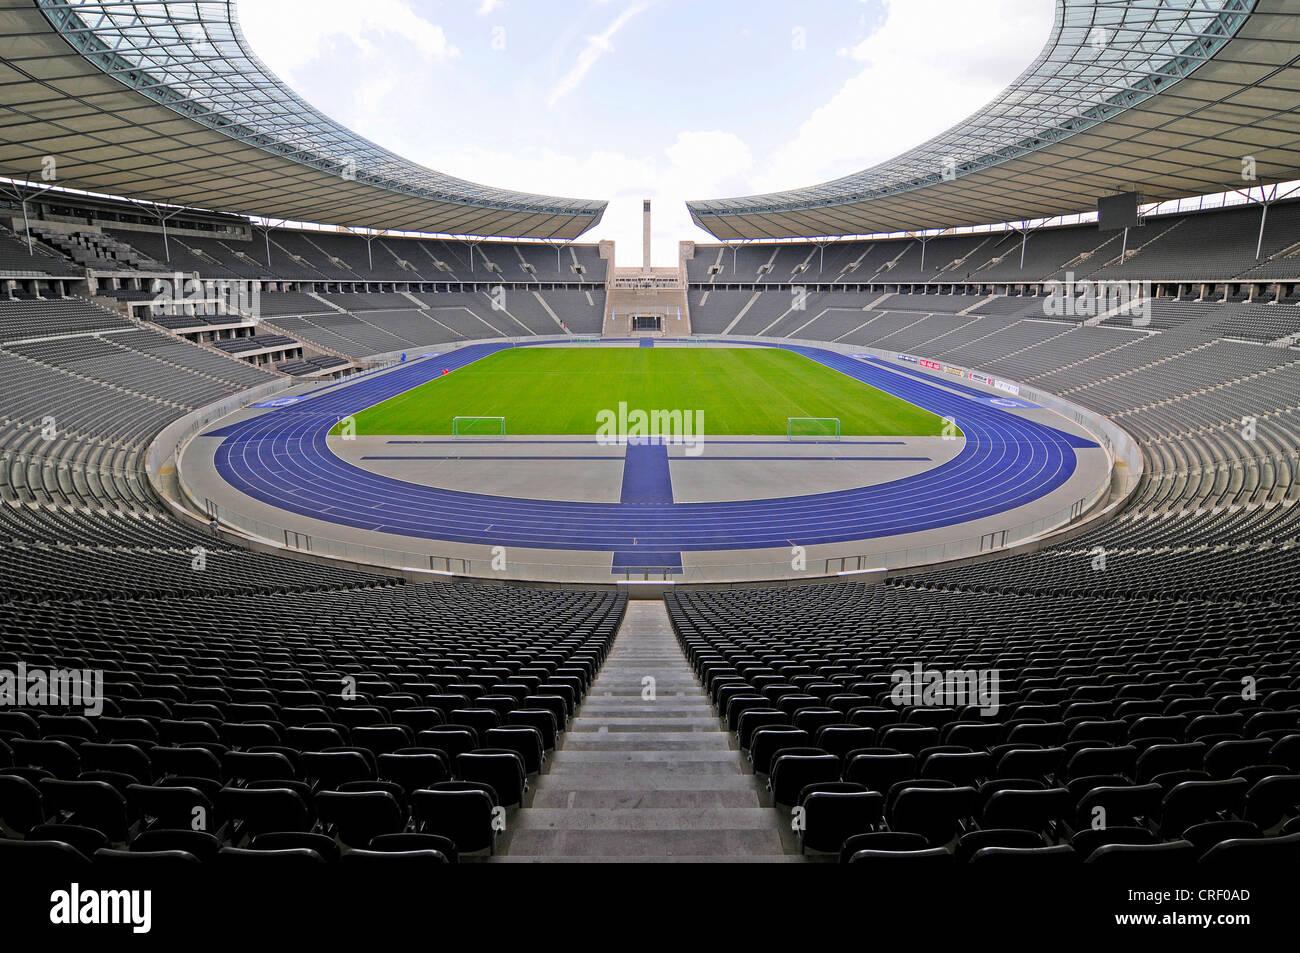 Olympiastadion, olympic stadion, Germany, Berlin - Stock Image